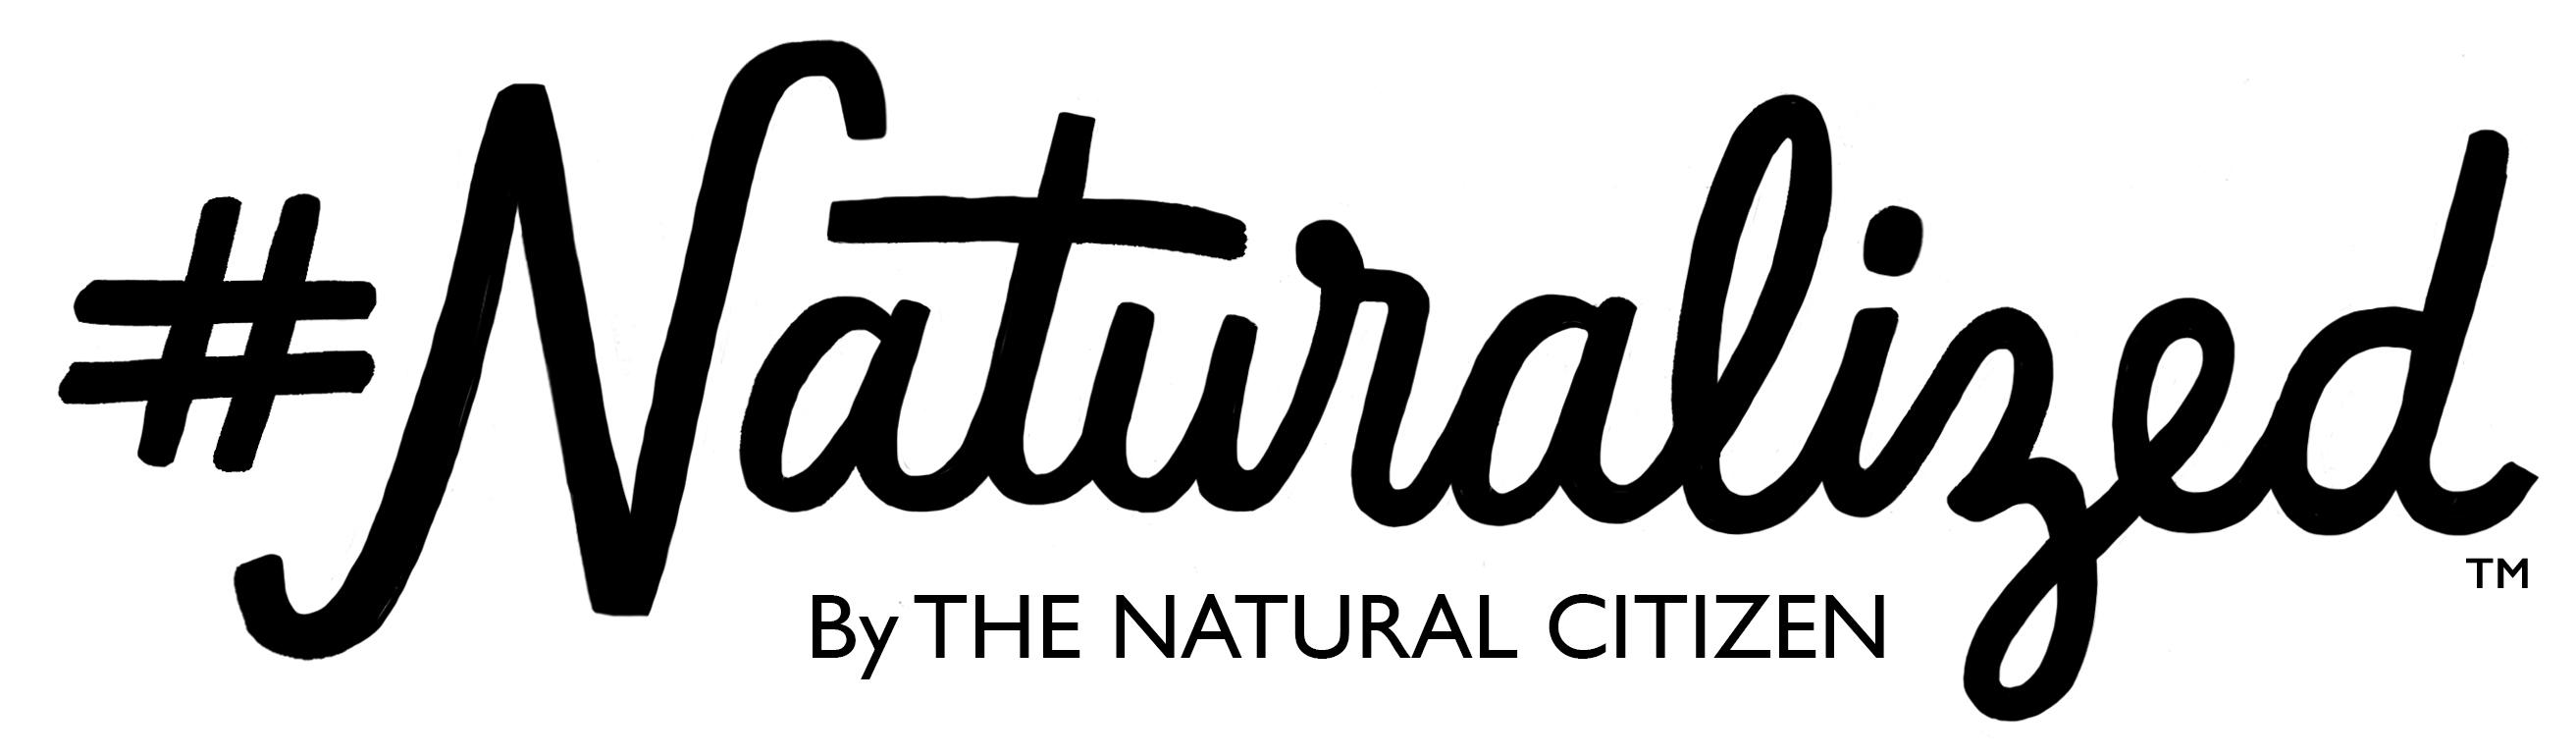 The Natural Citizen Blog